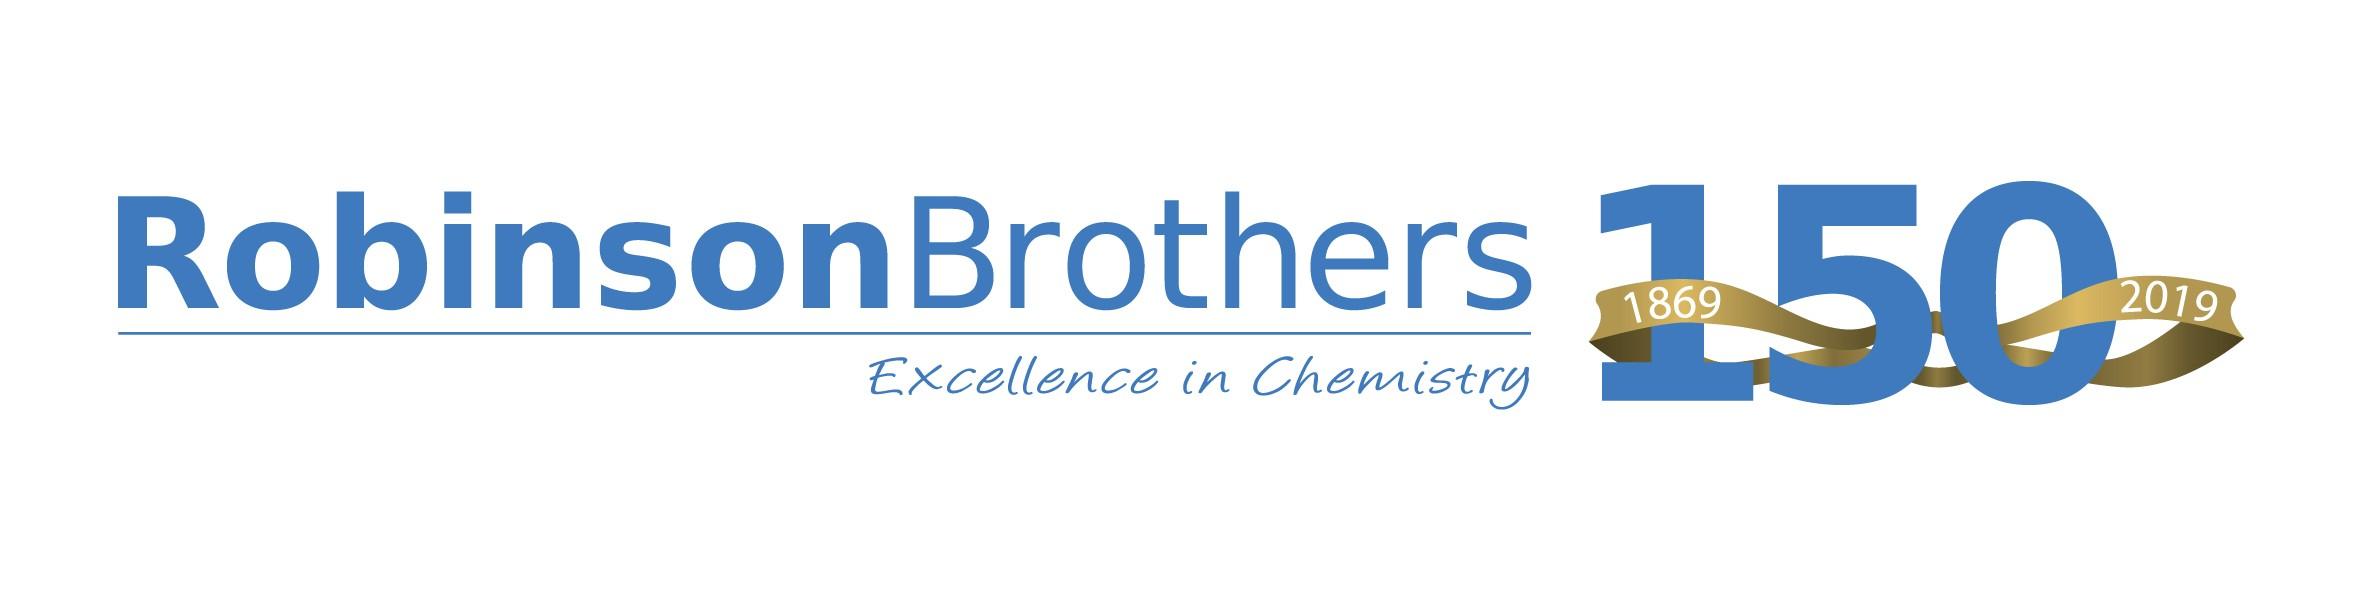 Robinson Brothers logo